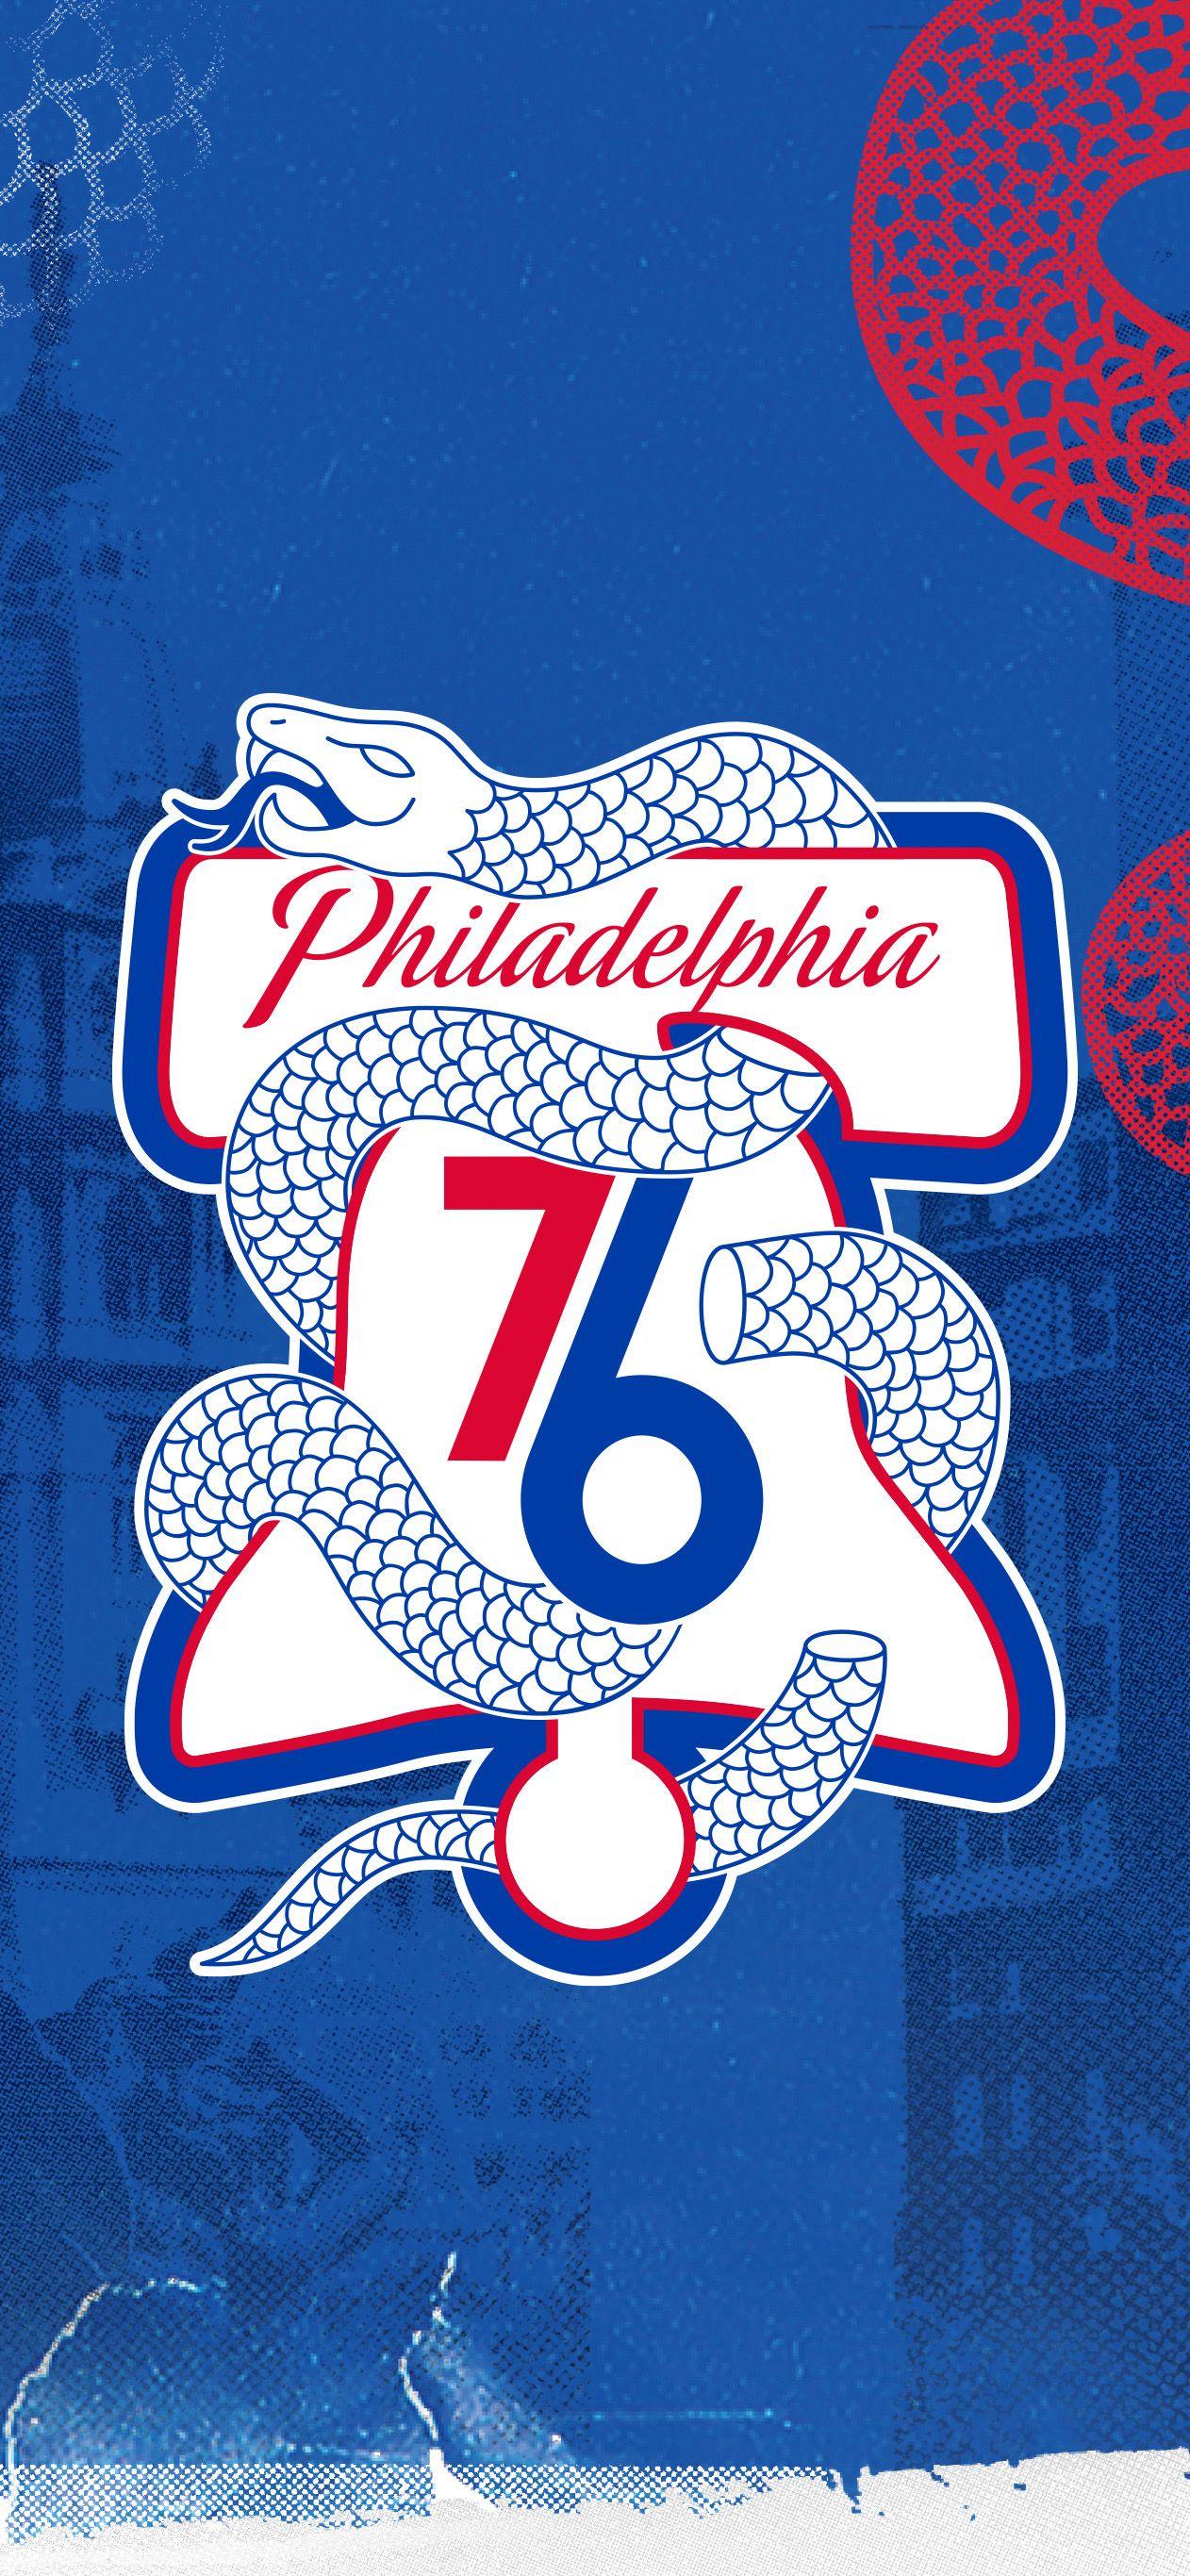 Philadelphia 76ers Sixers Wallpaper Philadelphia 76ers Team Wallpaper 76ers